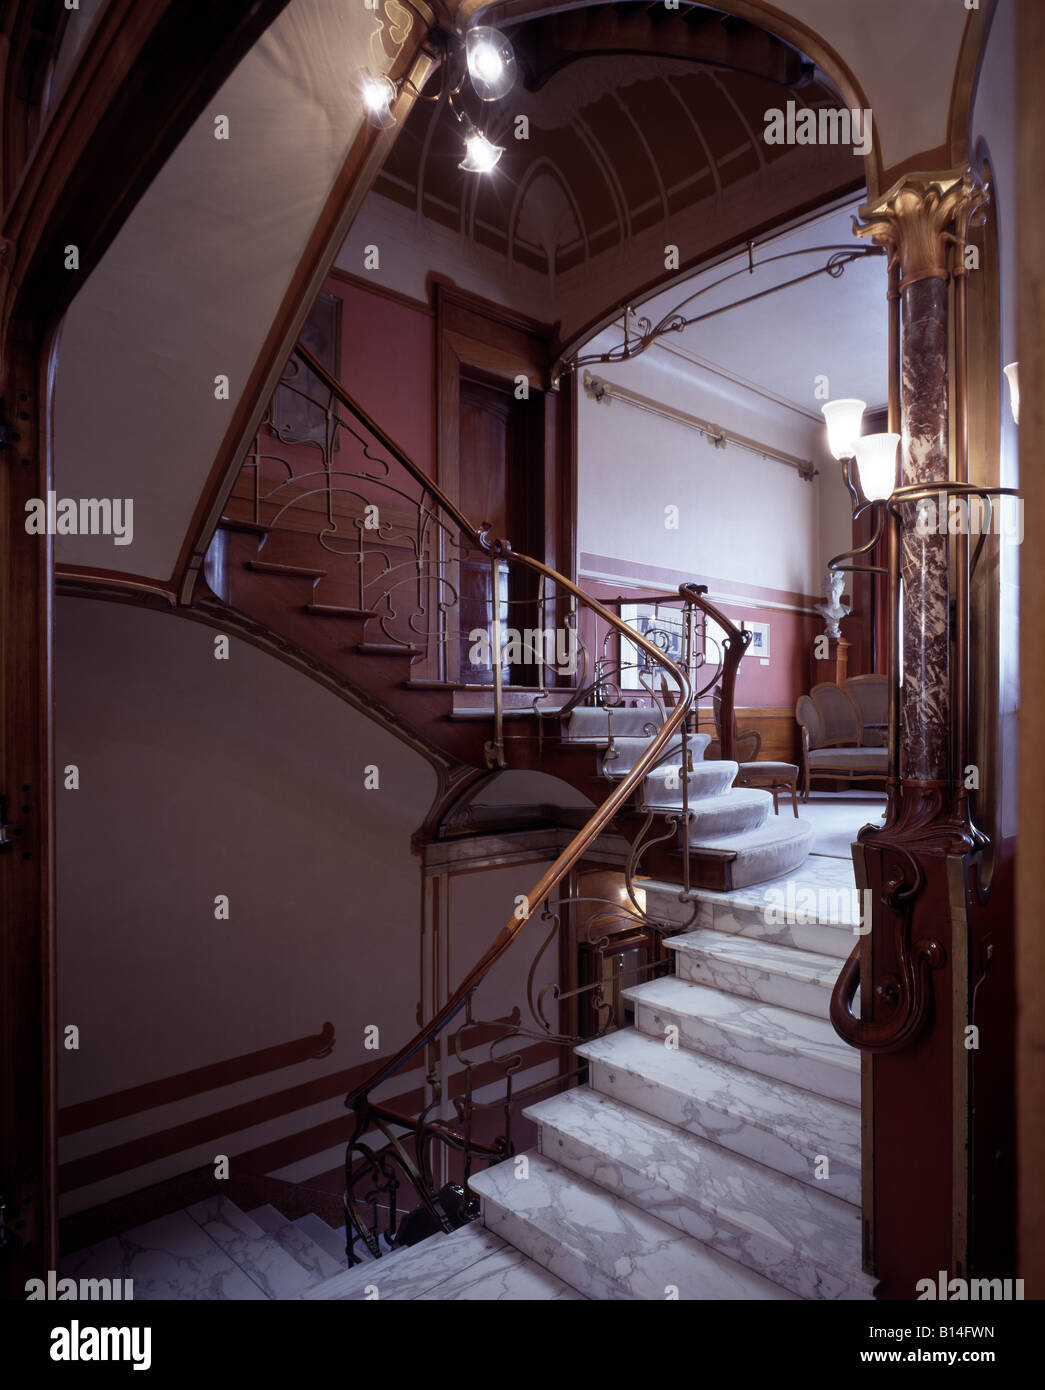 Brüssel, Horta Museum, Rue Américaine 25, Interieur, Treppenhaus Stockbild